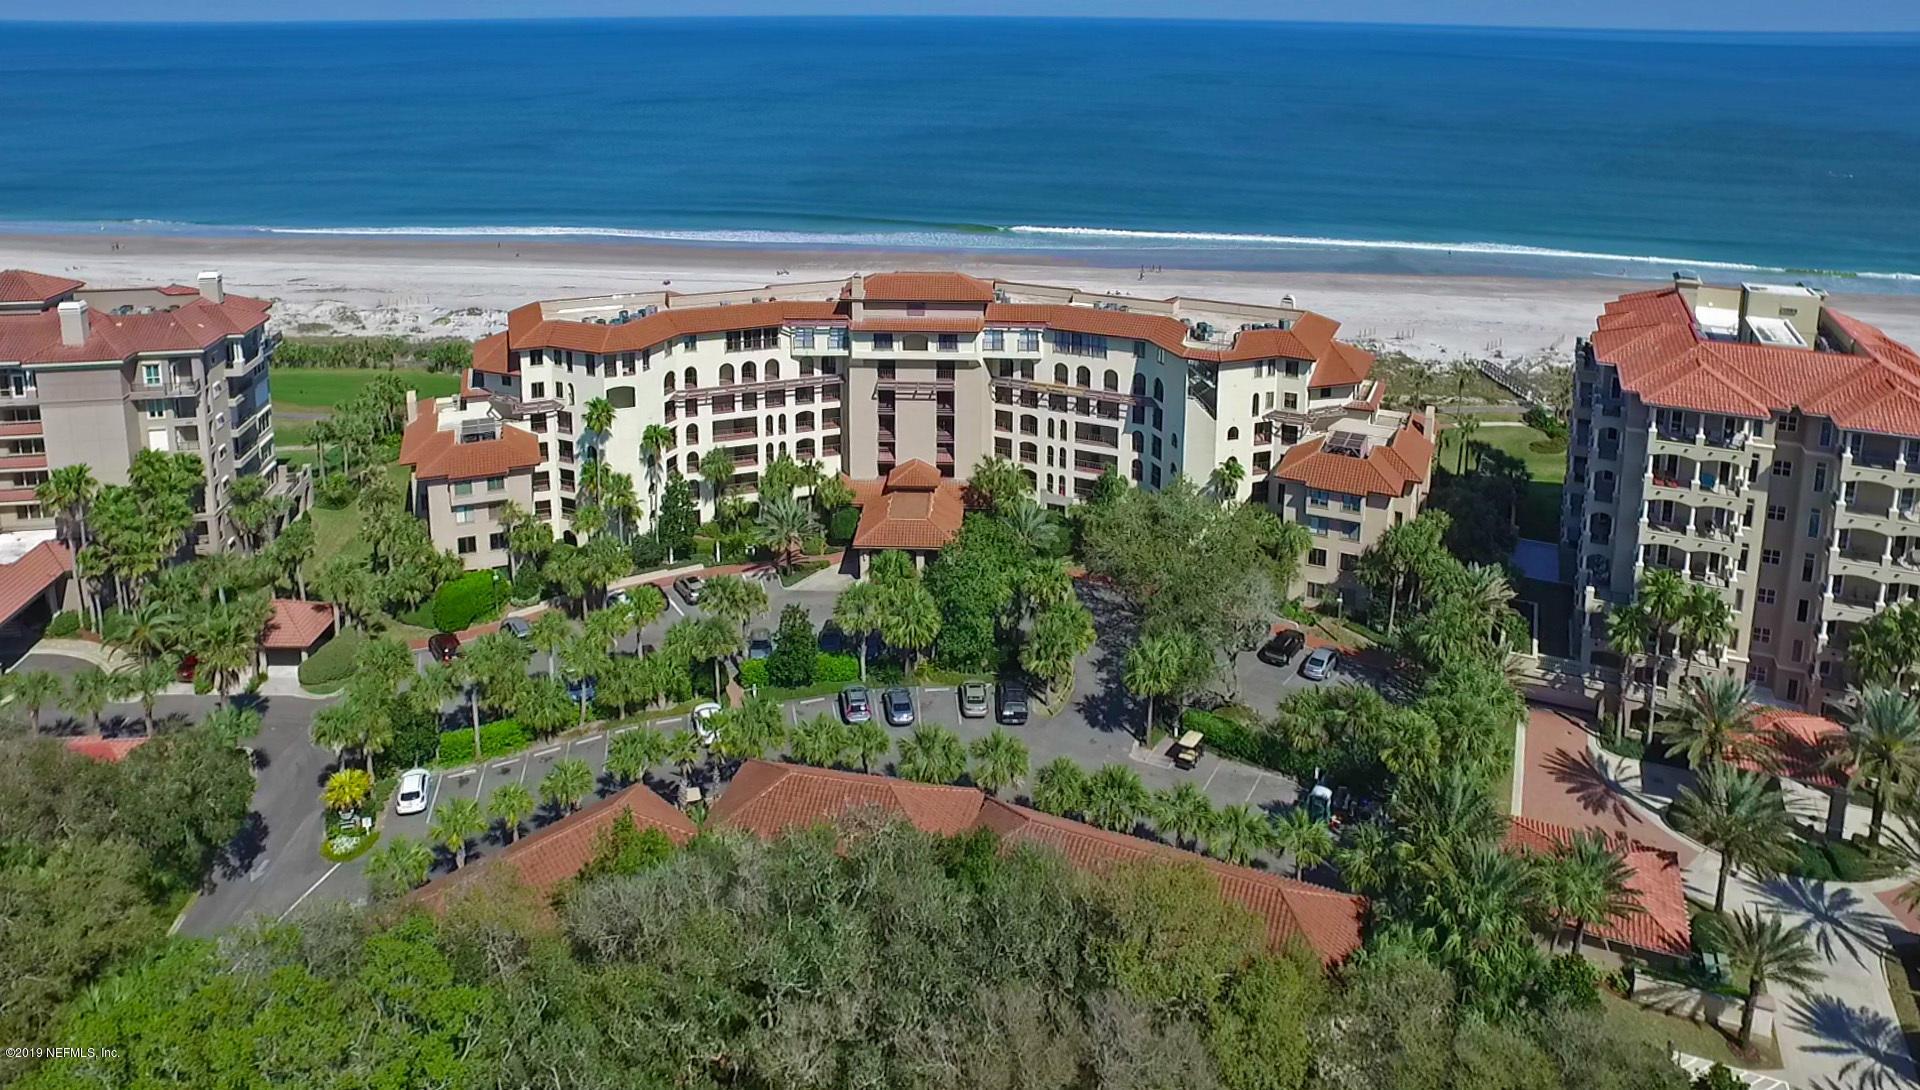 1670 SEA DUNES, FERNANDINA BEACH, FLORIDA 32034, 2 Bedrooms Bedrooms, ,2 BathroomsBathrooms,Condo,For sale,SEA DUNES,994795